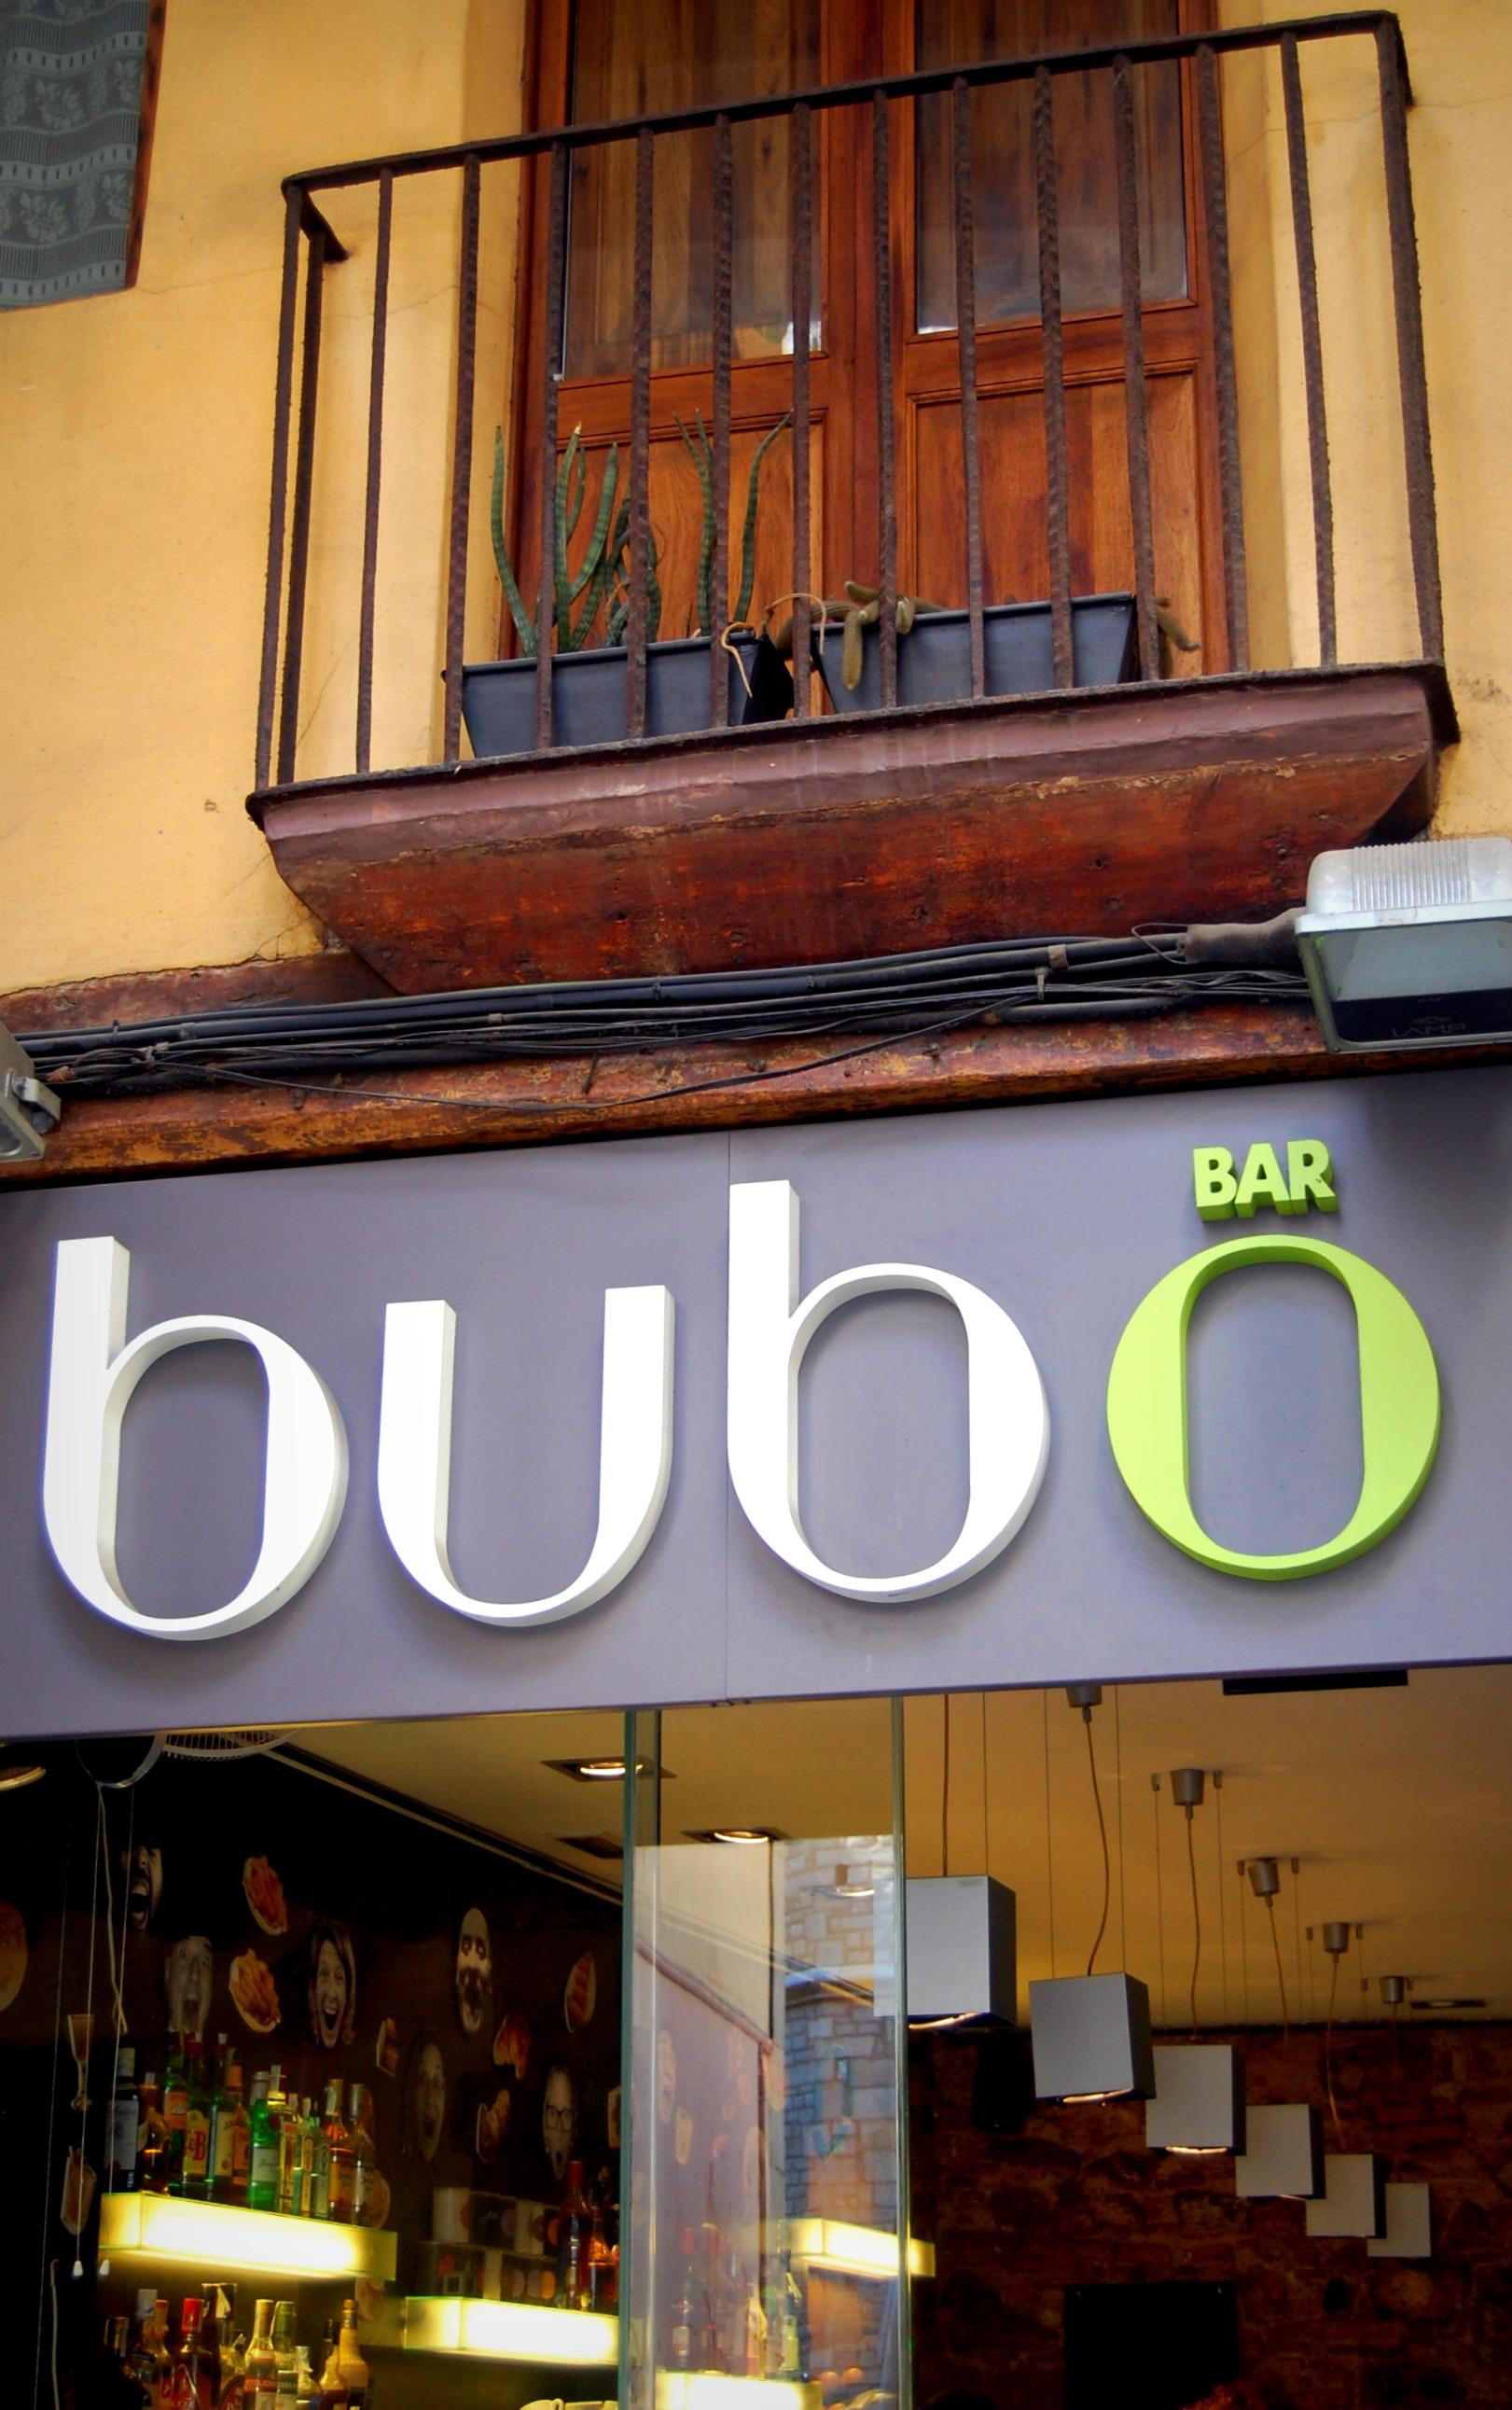 Bubo, Barcelona, Spain